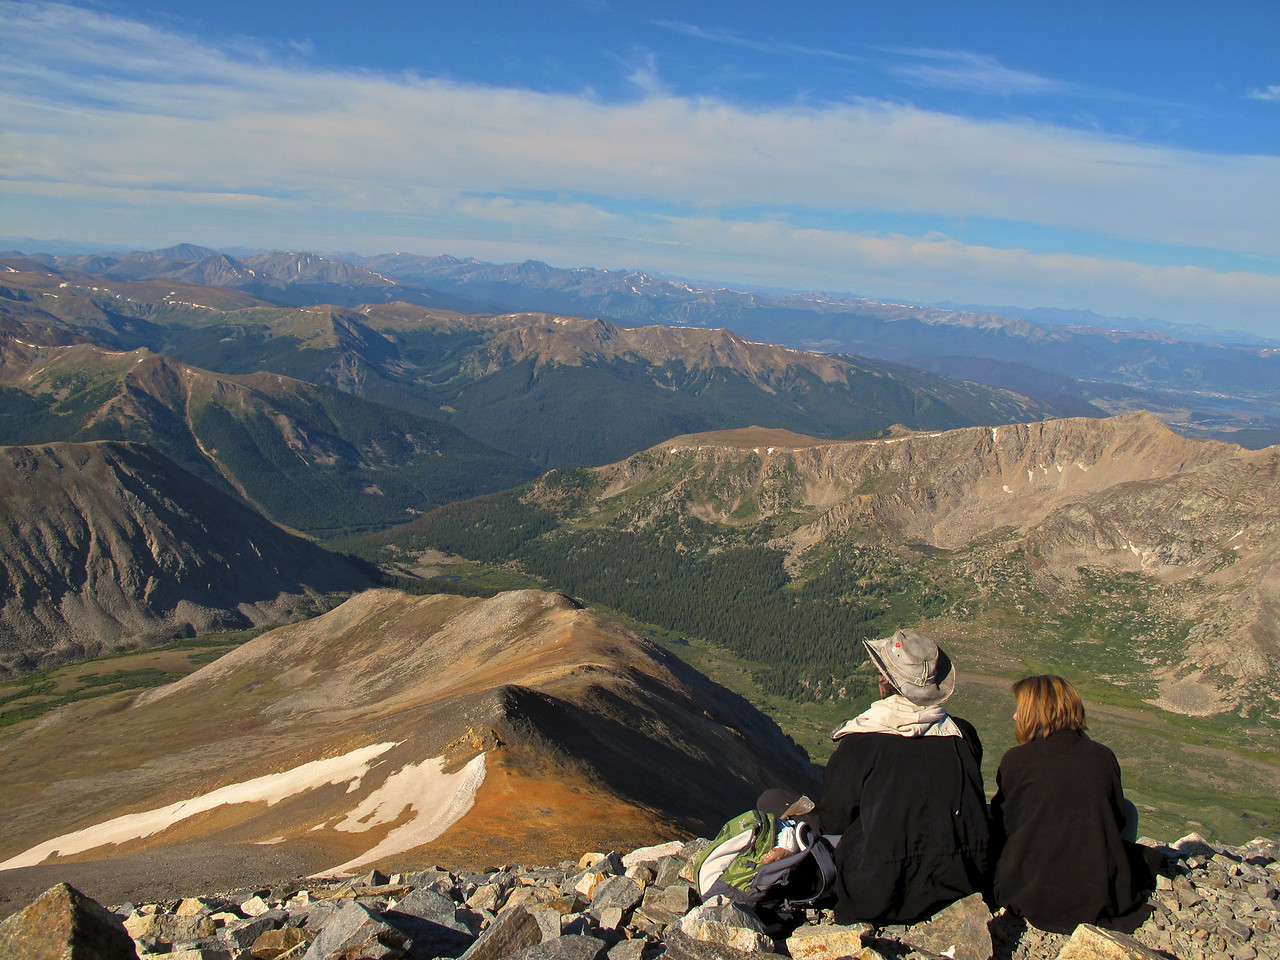 Some fellow hikers enjoy the view looking towards Breckenridge Ski Area.